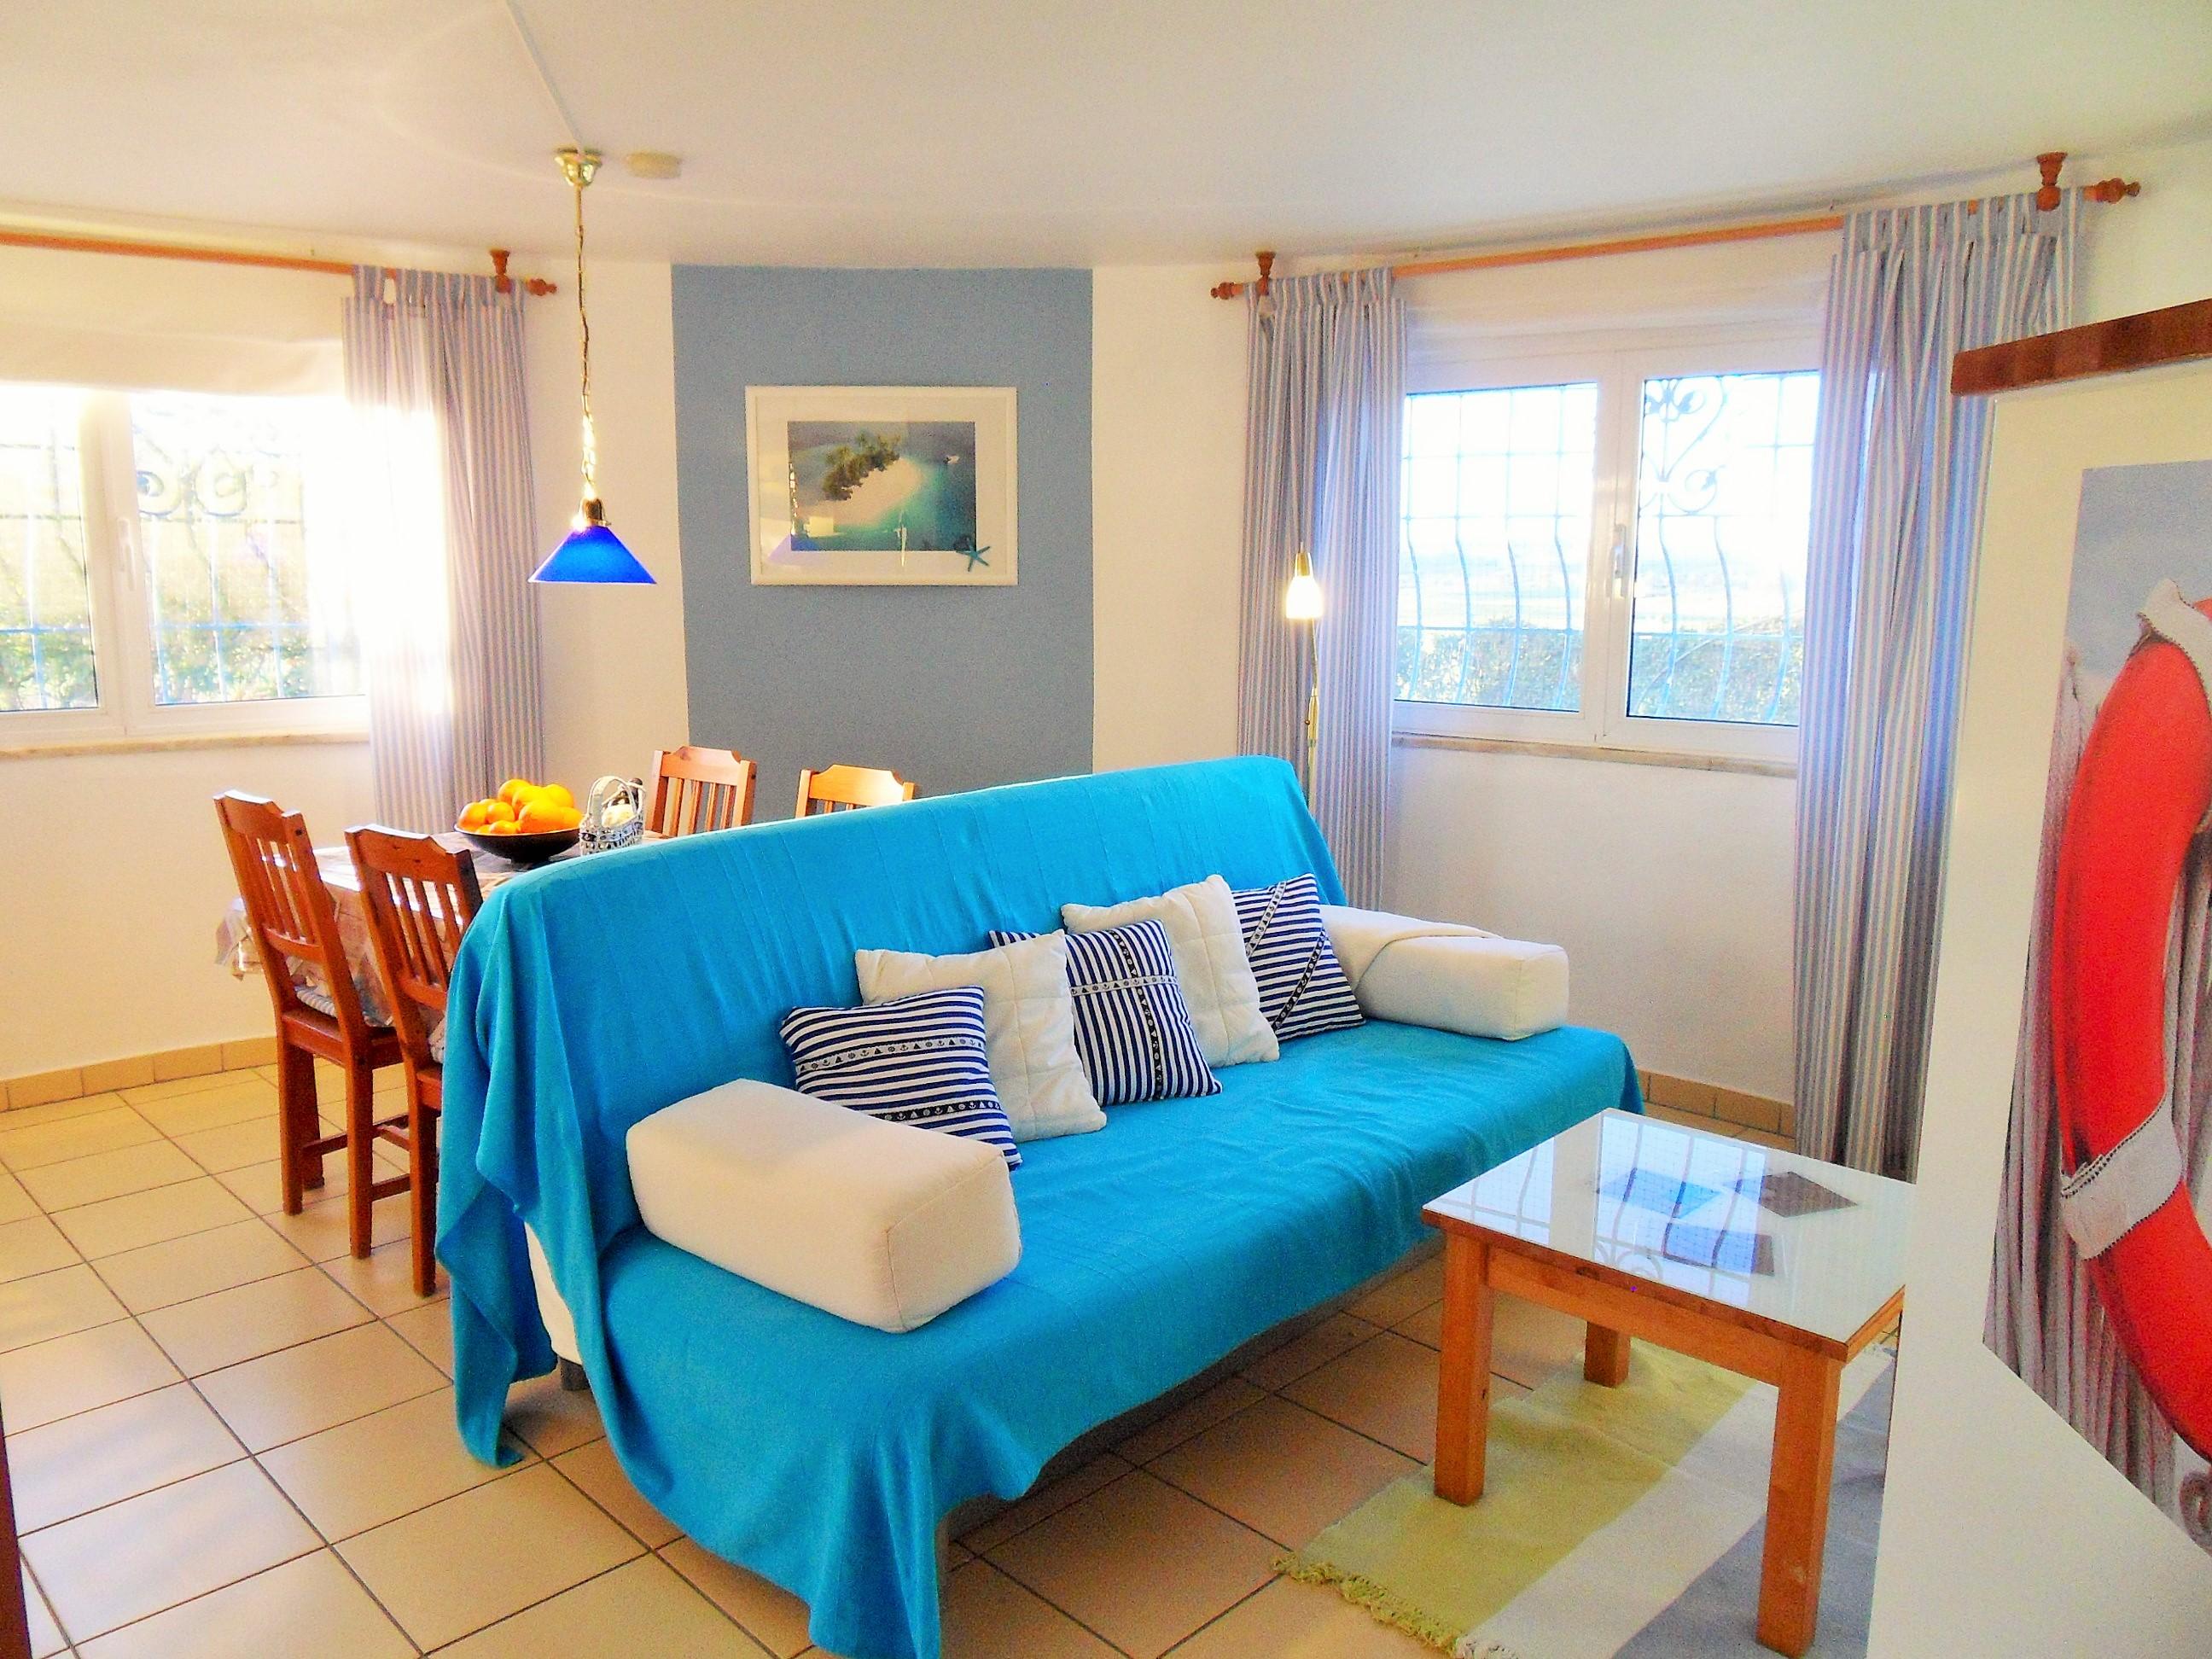 Holiday apartments and villas for rent, Apartment Sétimo Céu (Seventh Heaven) in Castro Marim, Portugal Algarve, REF_IMG_9017_9024